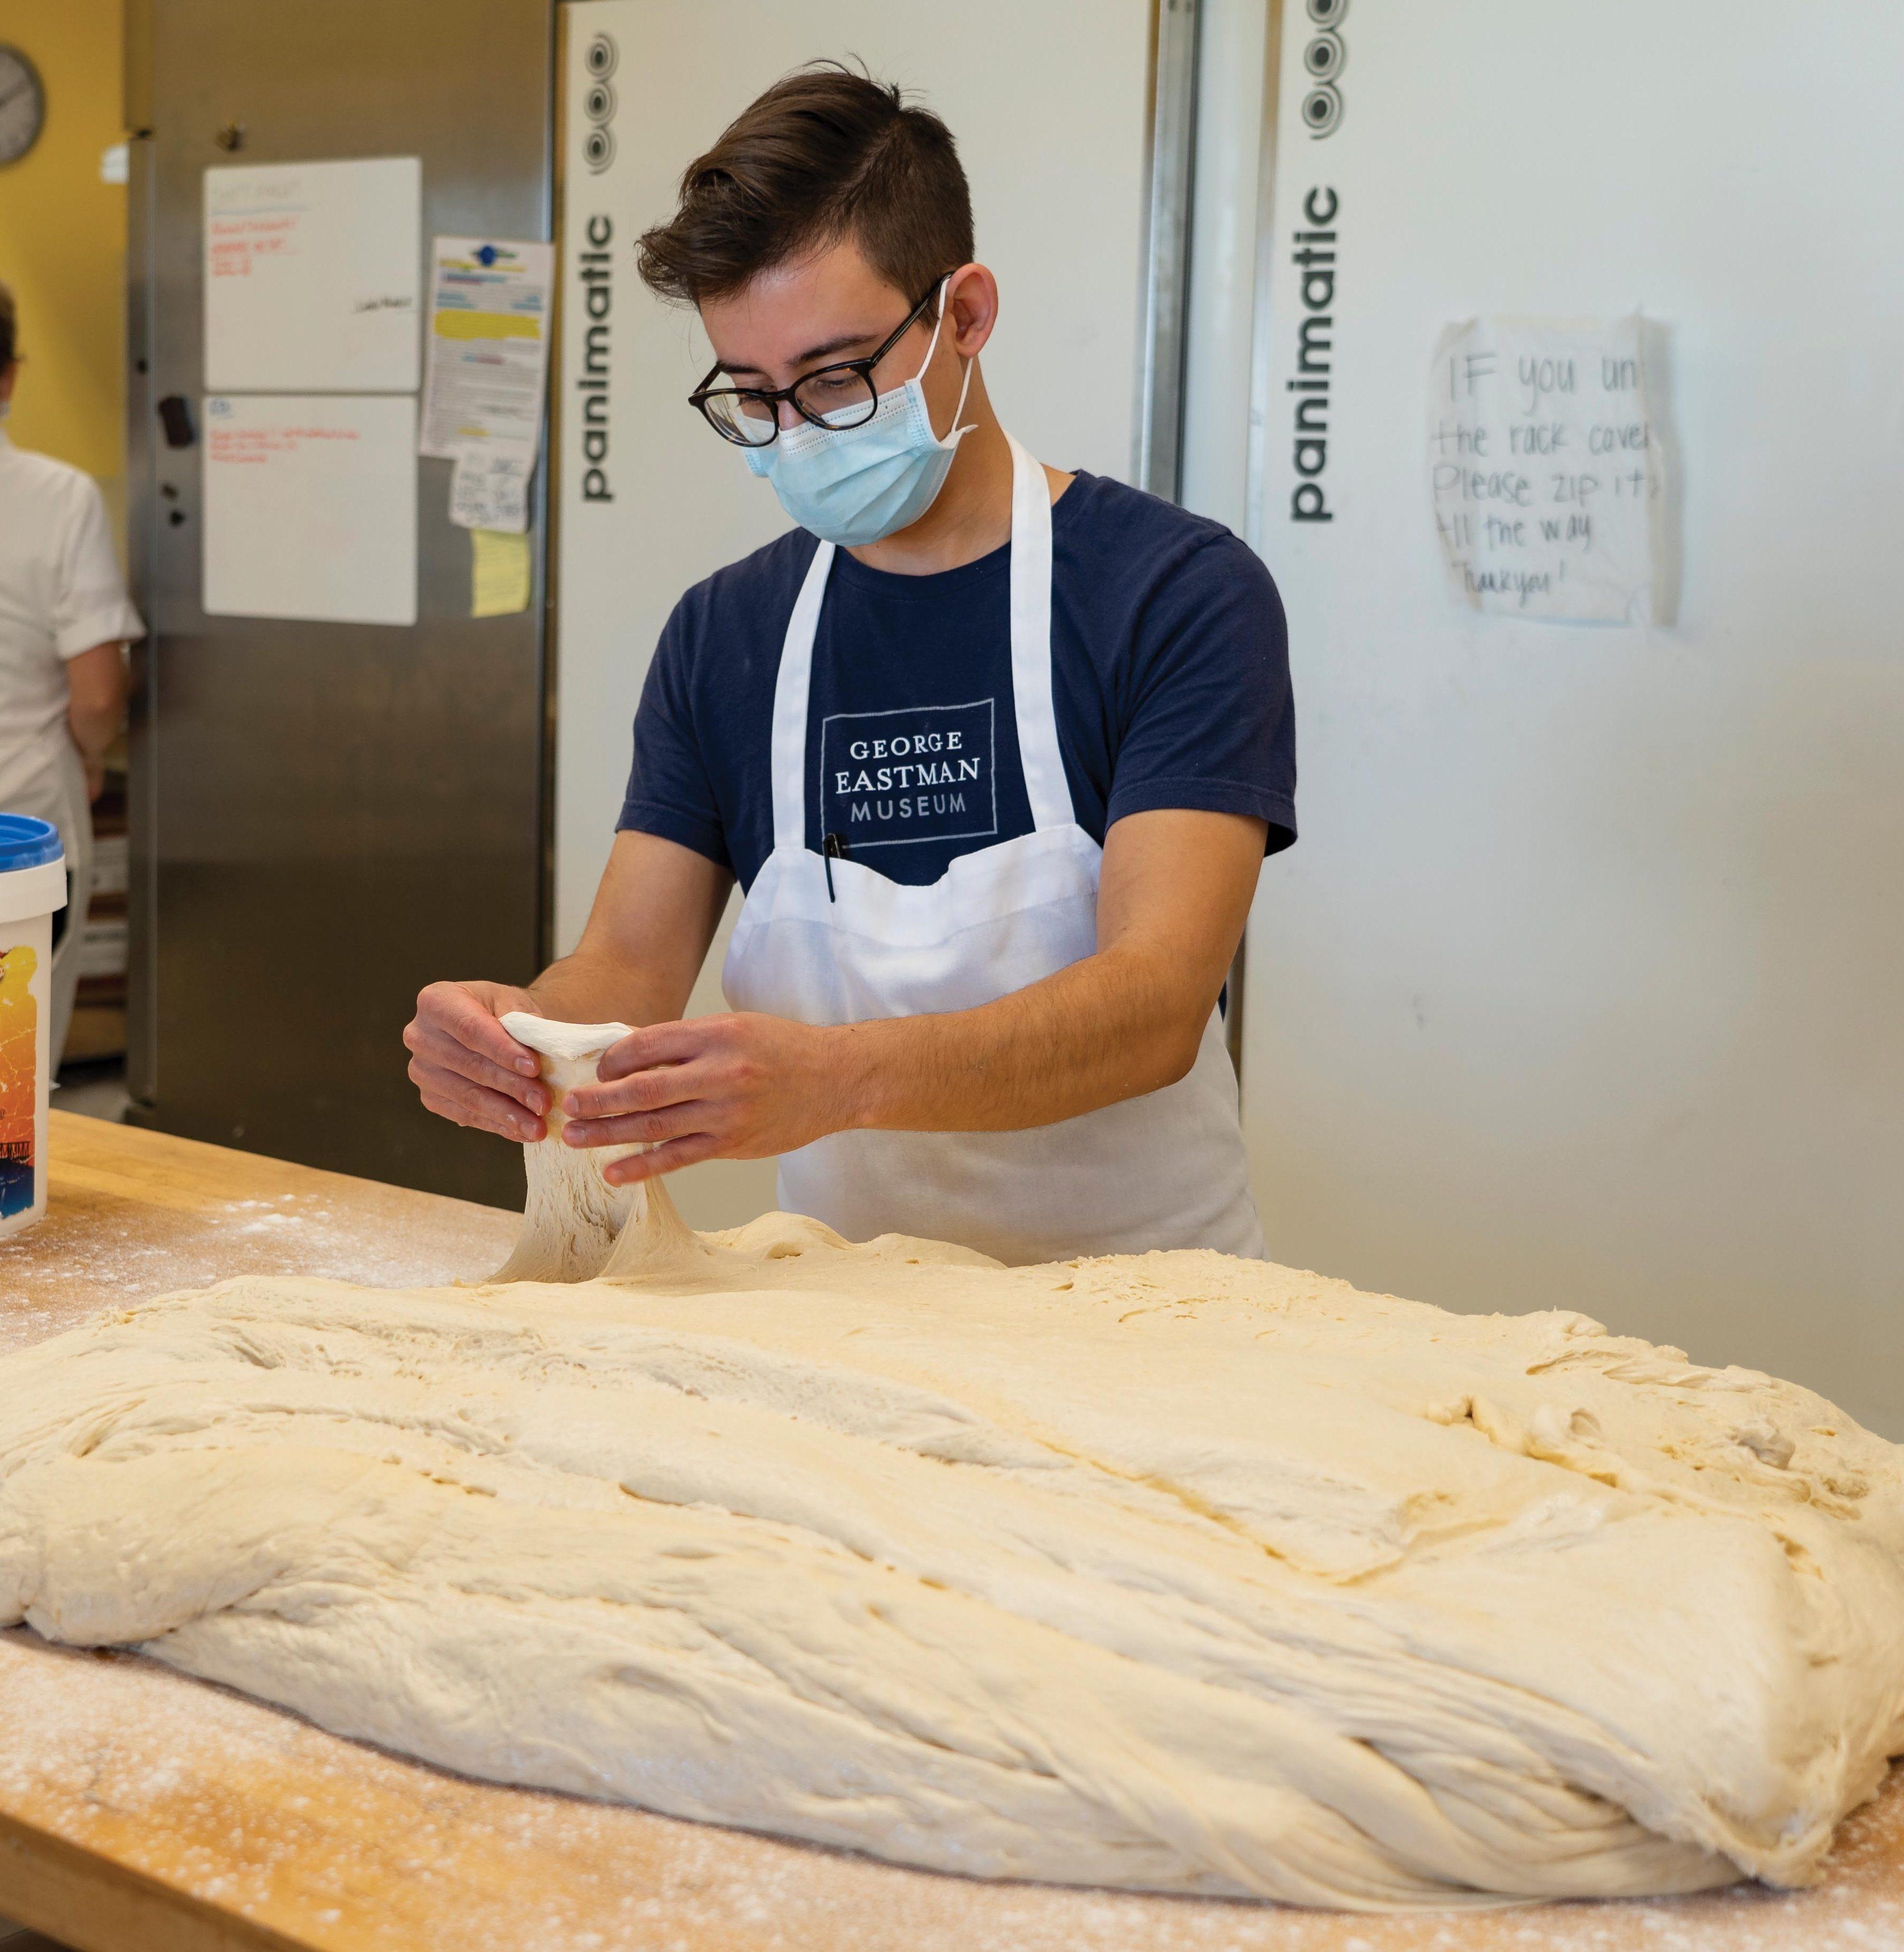 Philip DeOliveira, Great Lakes Baking Company